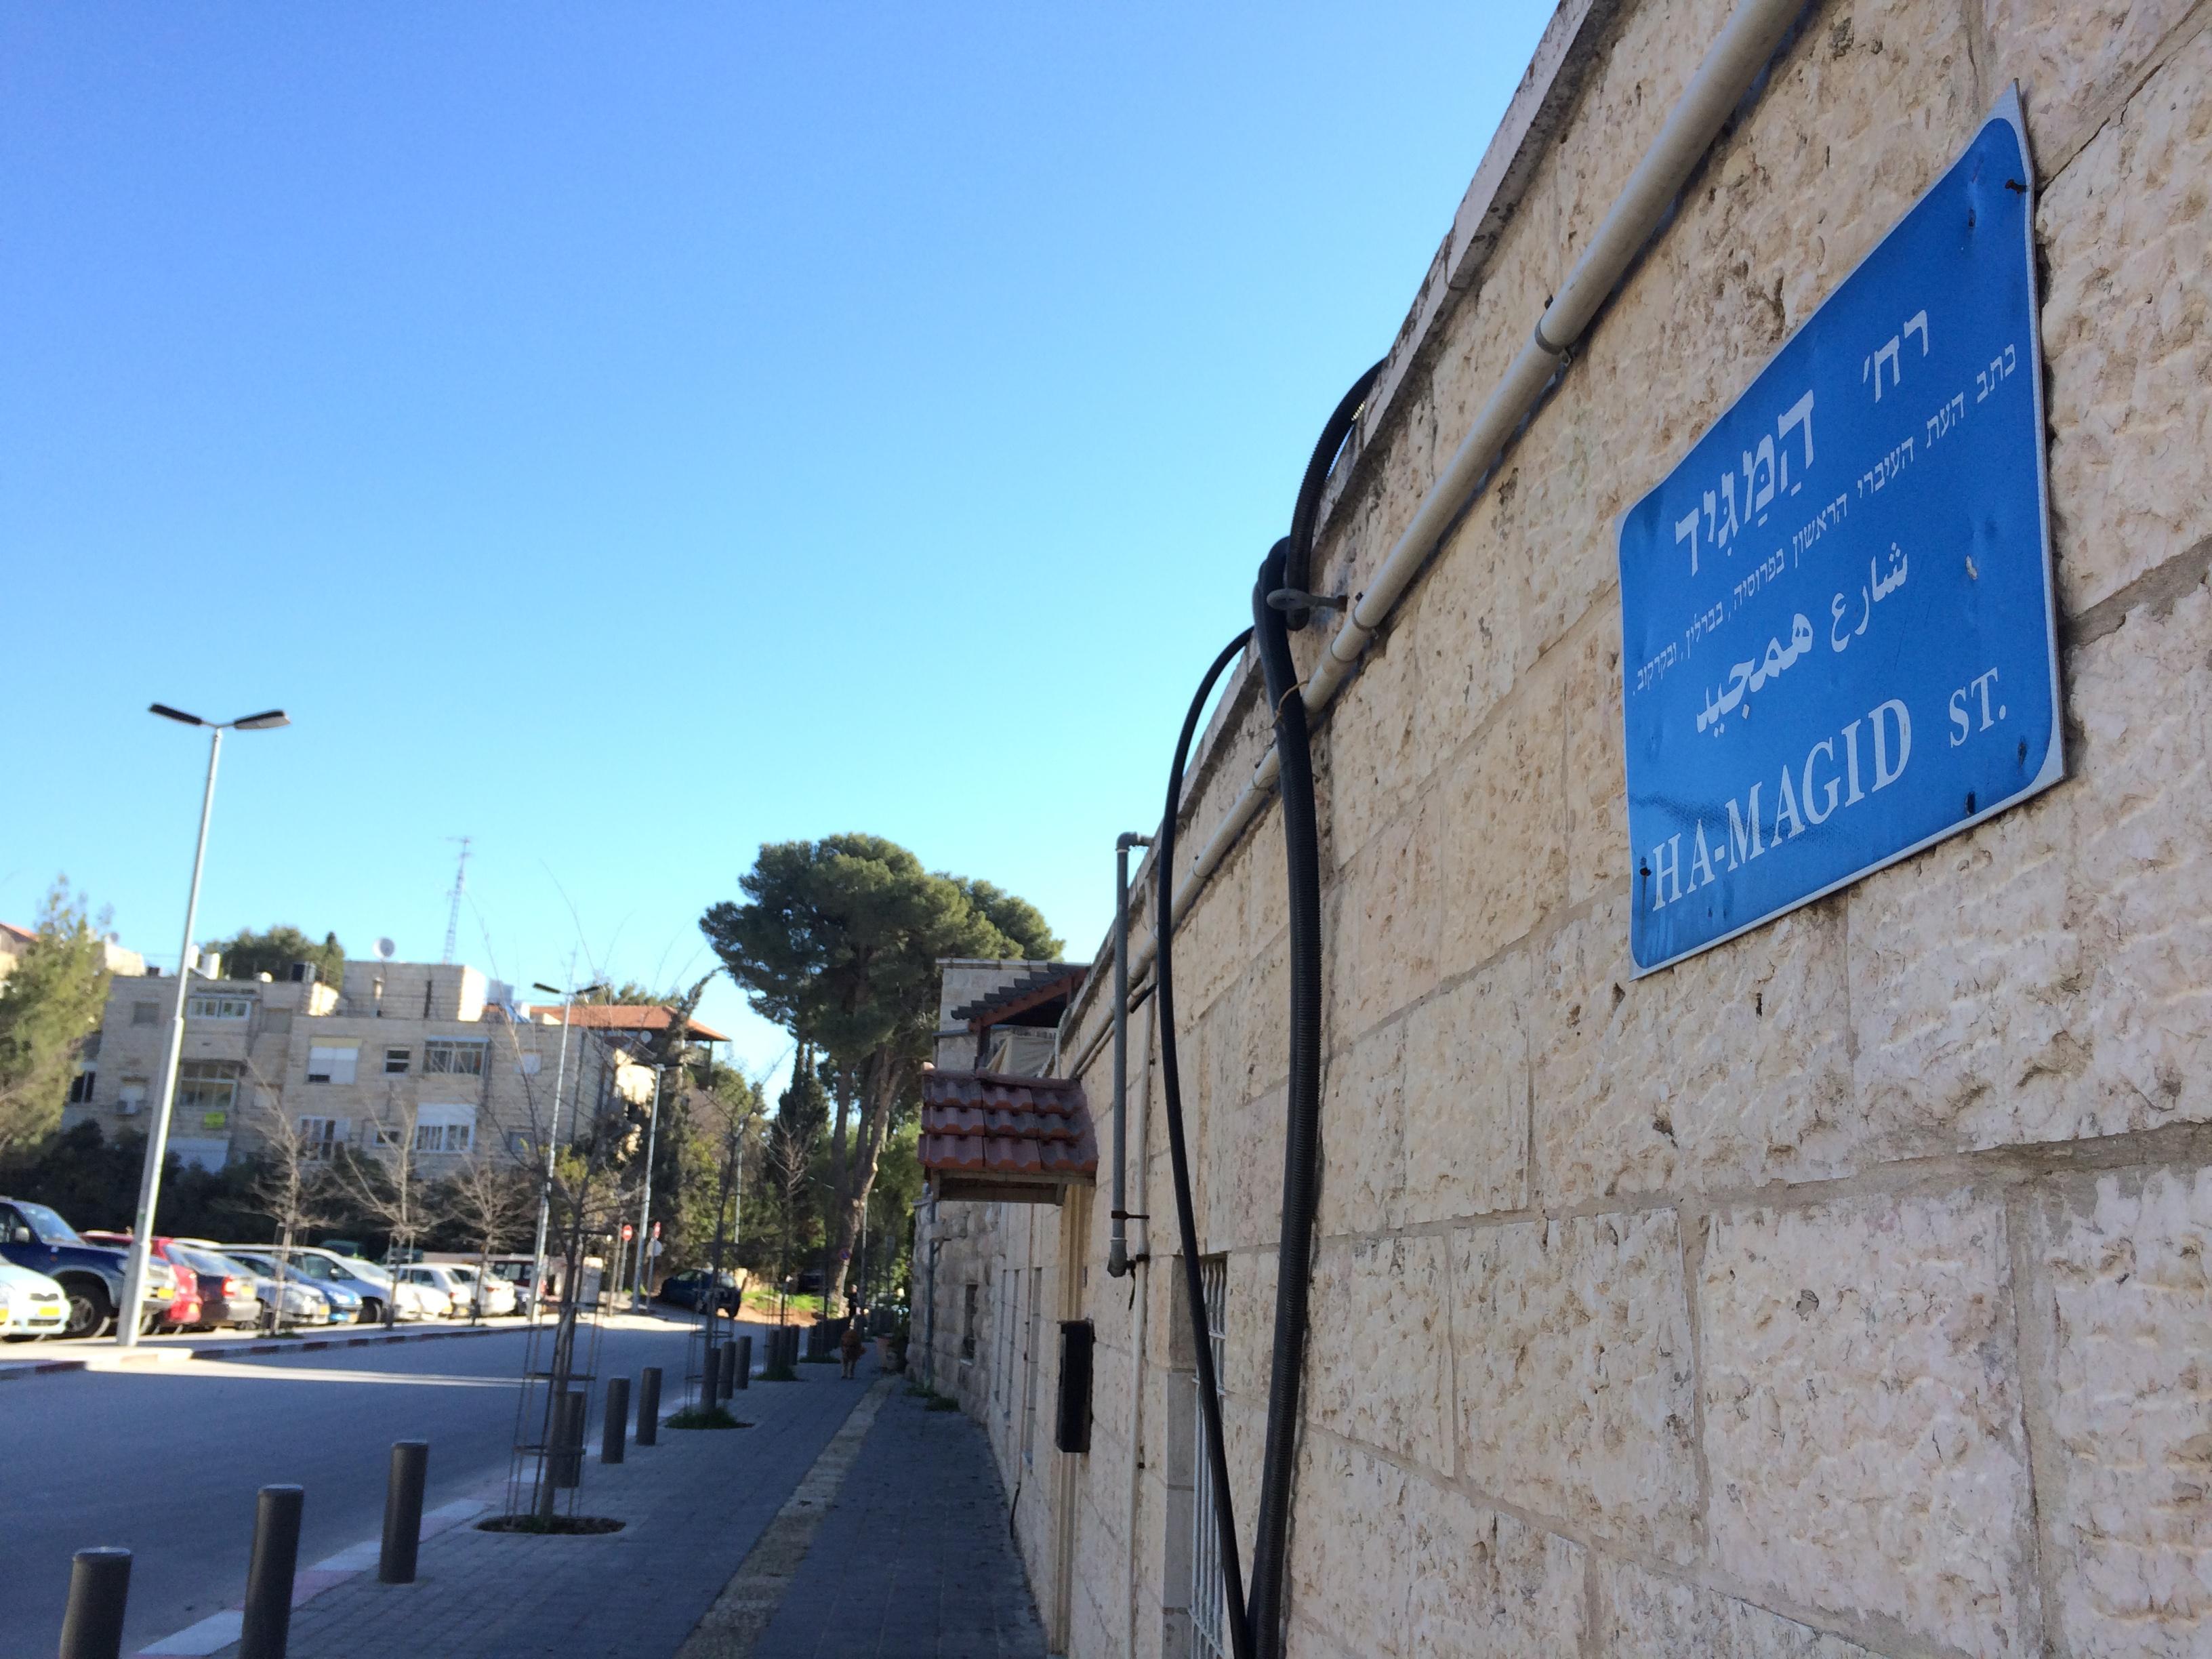 Jutzot Ierushalaim – XXI – Las calles de Jerusalém: Hamagid